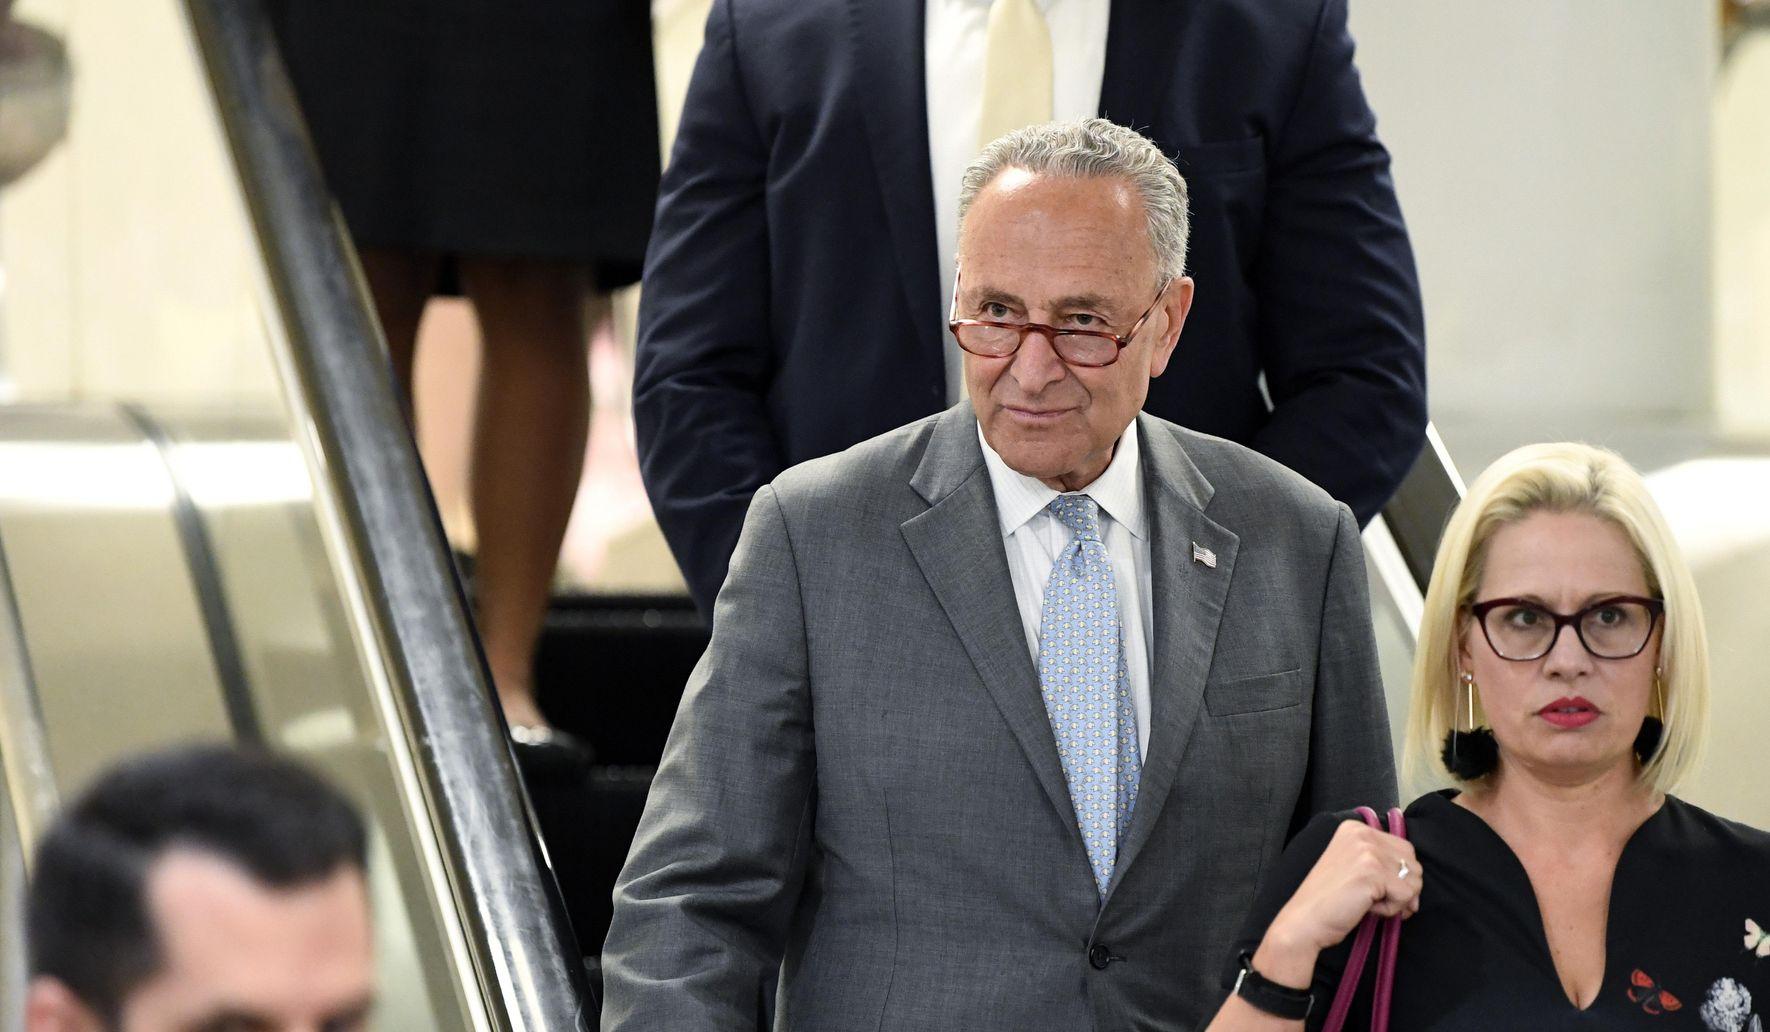 AP Explains: Congress' fight over election security bills